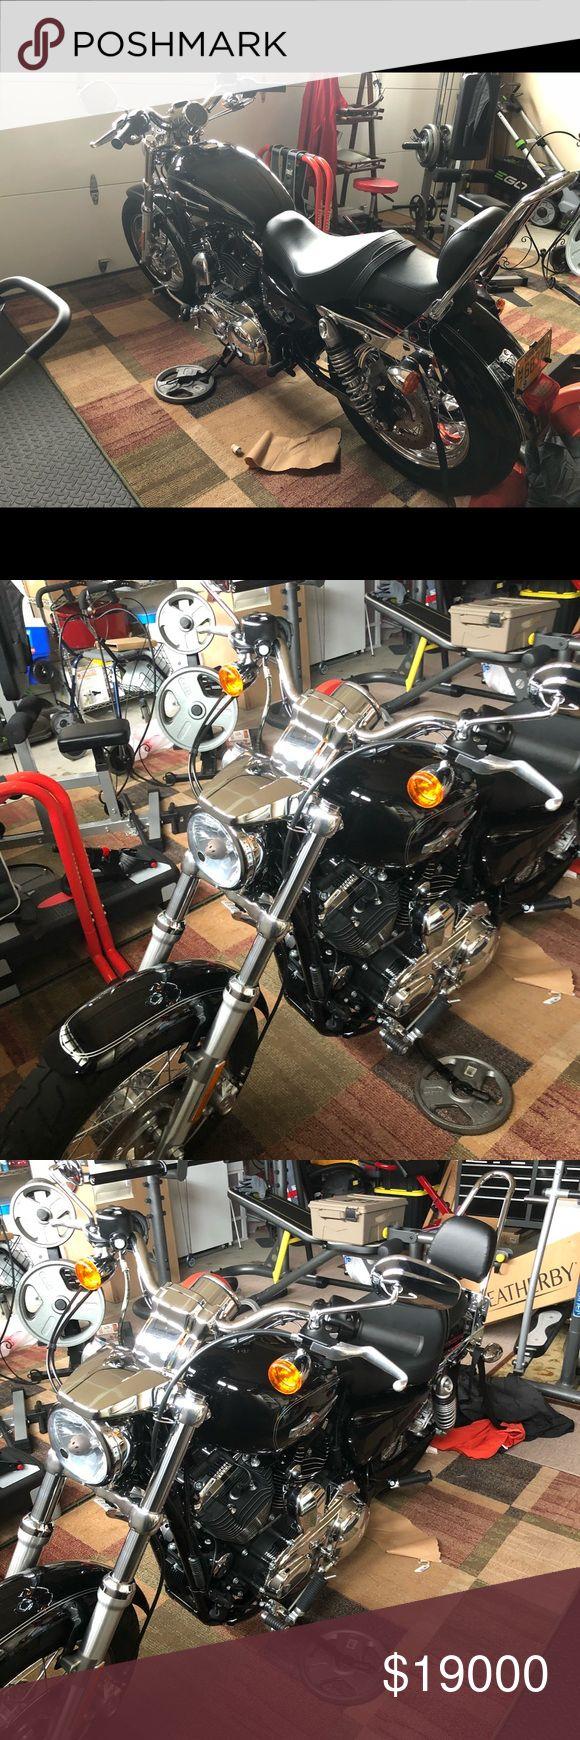 Best 25 1200 custom ideas on pinterest harley davidson harley davidson 1200 sport motorcycle 2017 fandeluxe Images